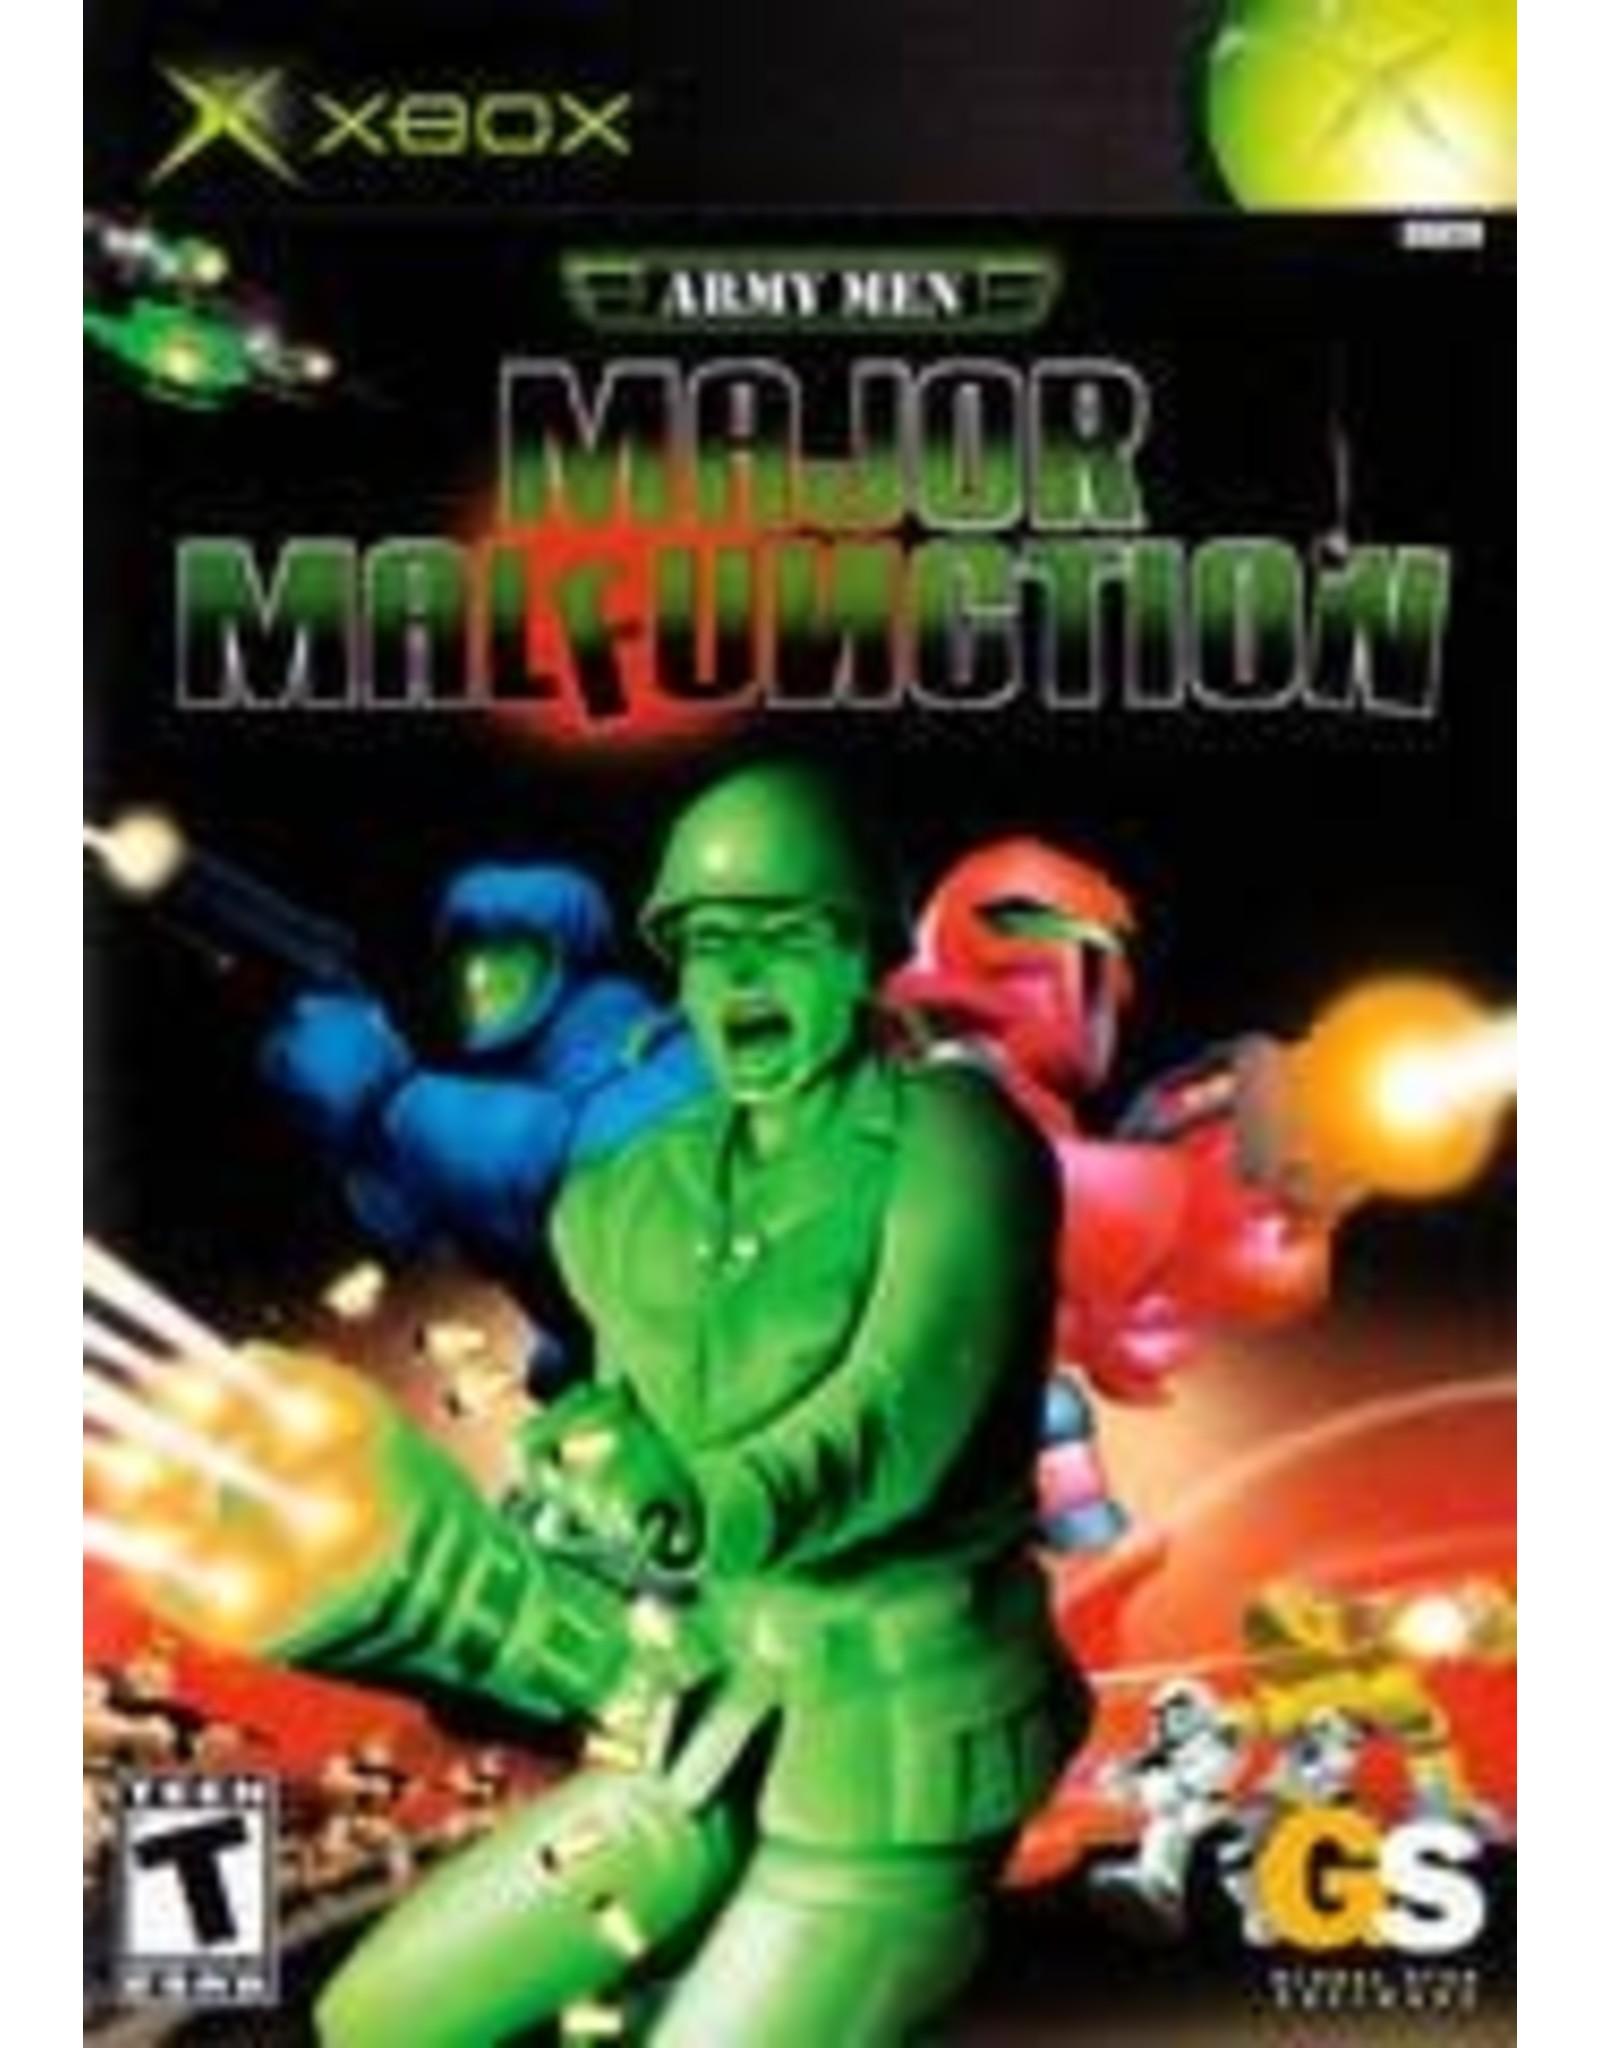 Xbox Army Men Major Malfunction (CiB)